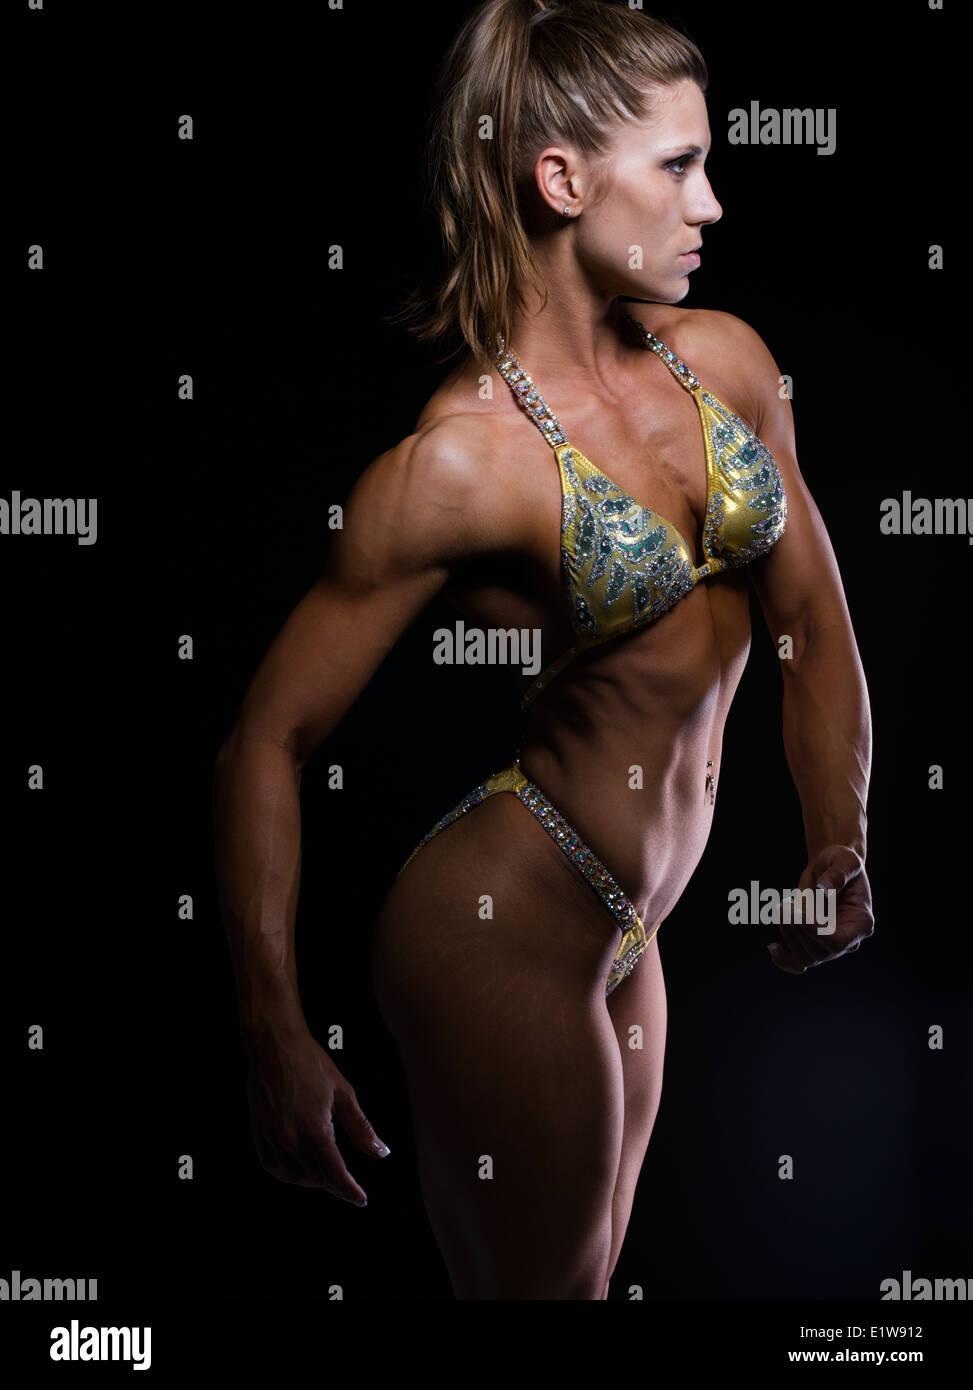 Muscular toned athletic woman - female body builder bodybuilder fitness model - Stock Image